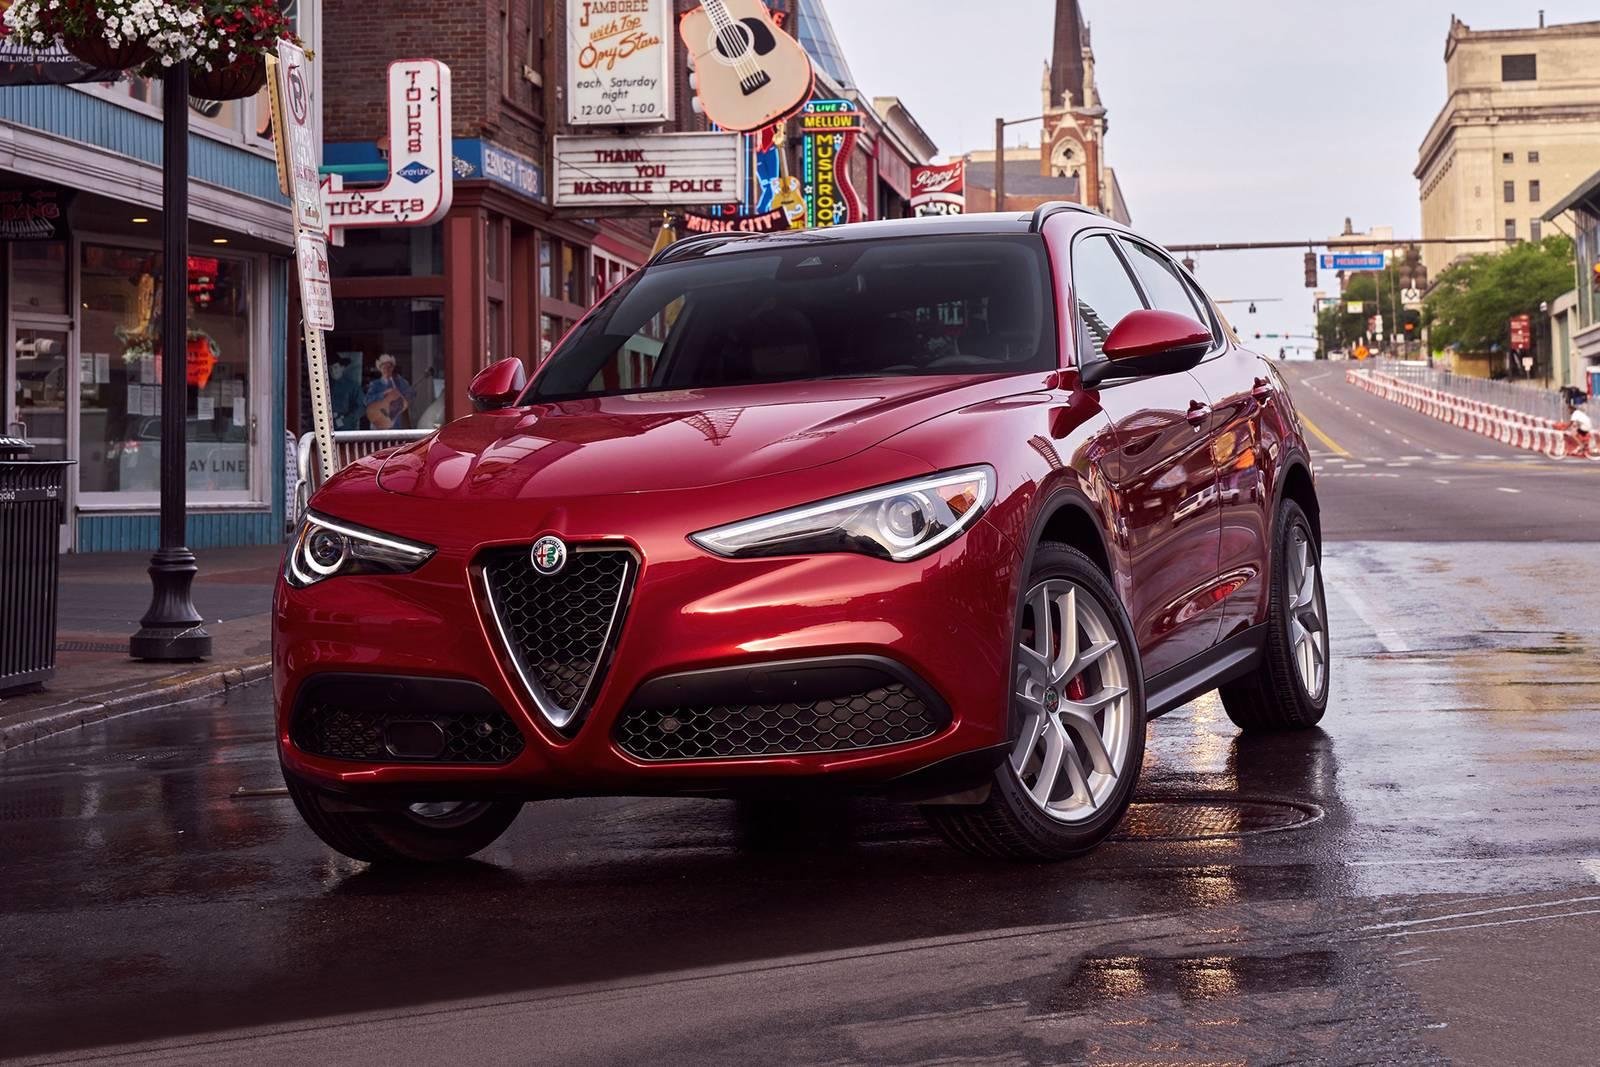 2019 Alfa Romeo Stelvio For Lease Autolux Sales Leasing